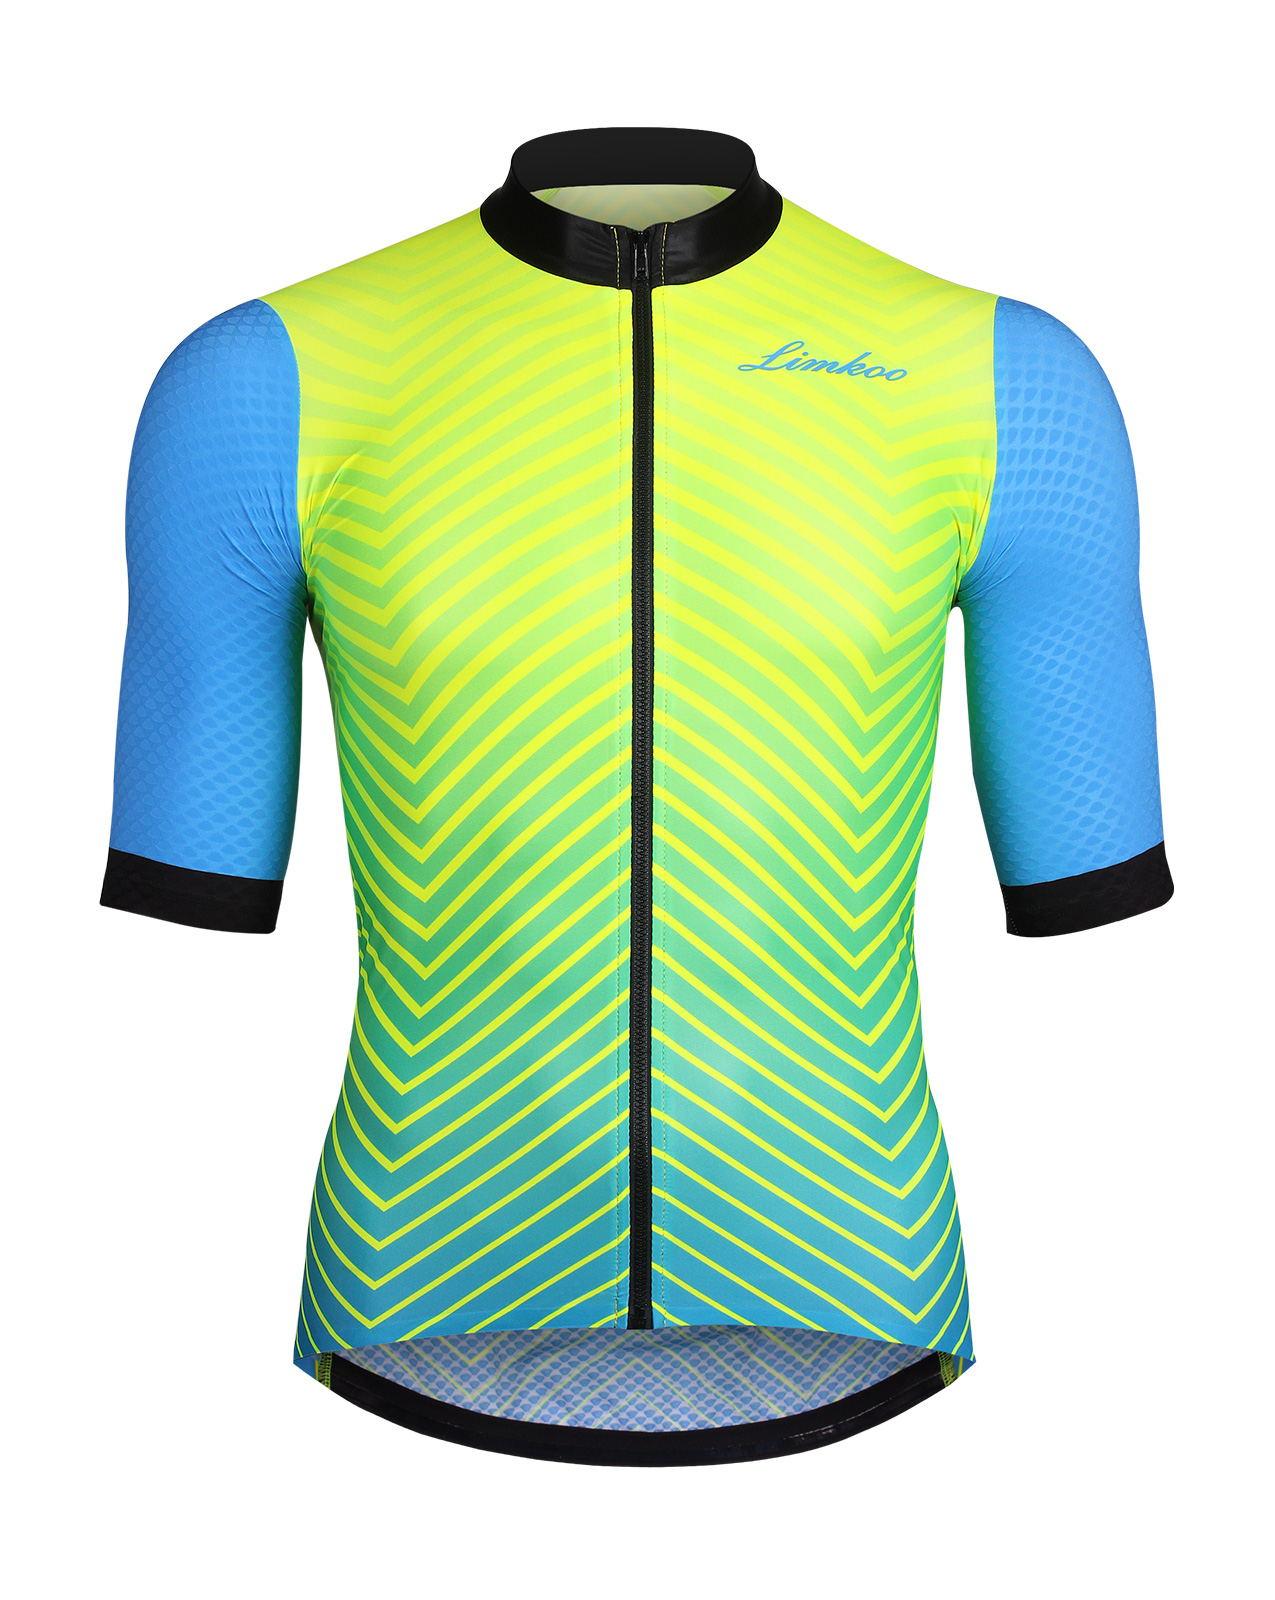 Italian AERO ALPHA Pro Race Cycling Jersey(WOVEN) 68ddaf047